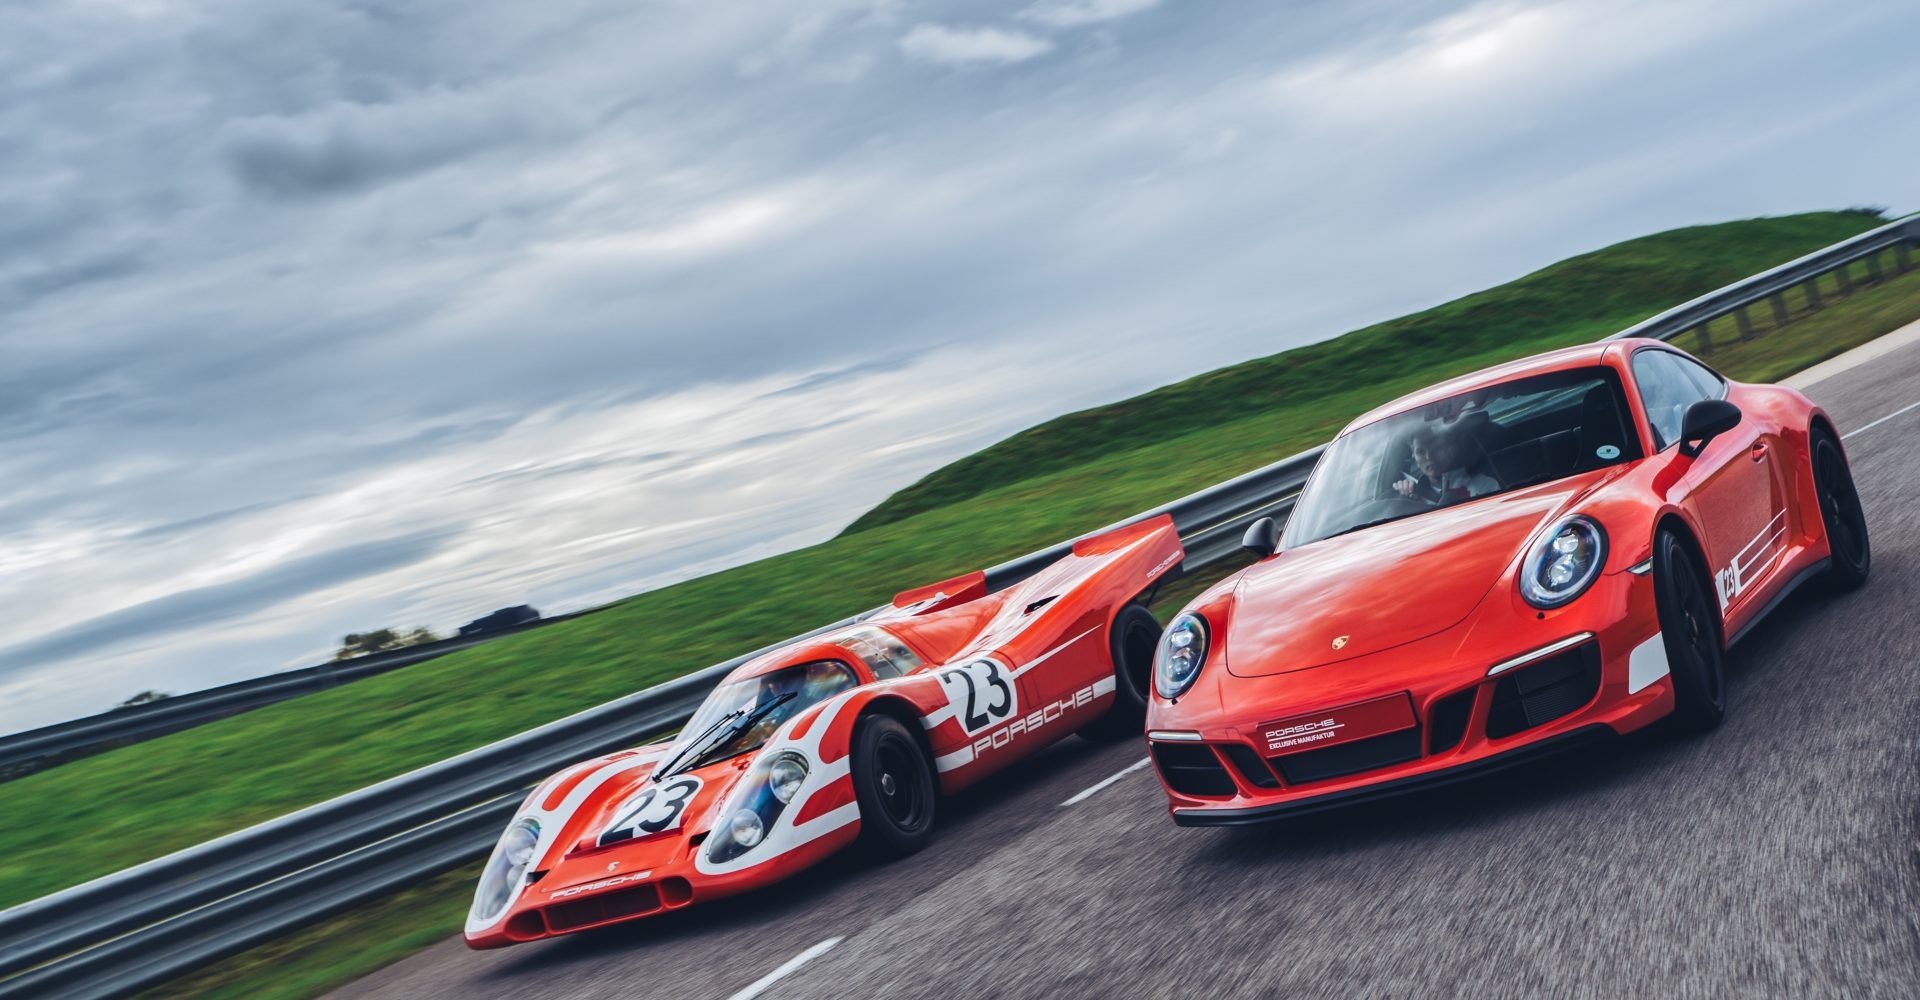 Porsche reveals Le Mans-inspired 'British Legends Edition' 911s